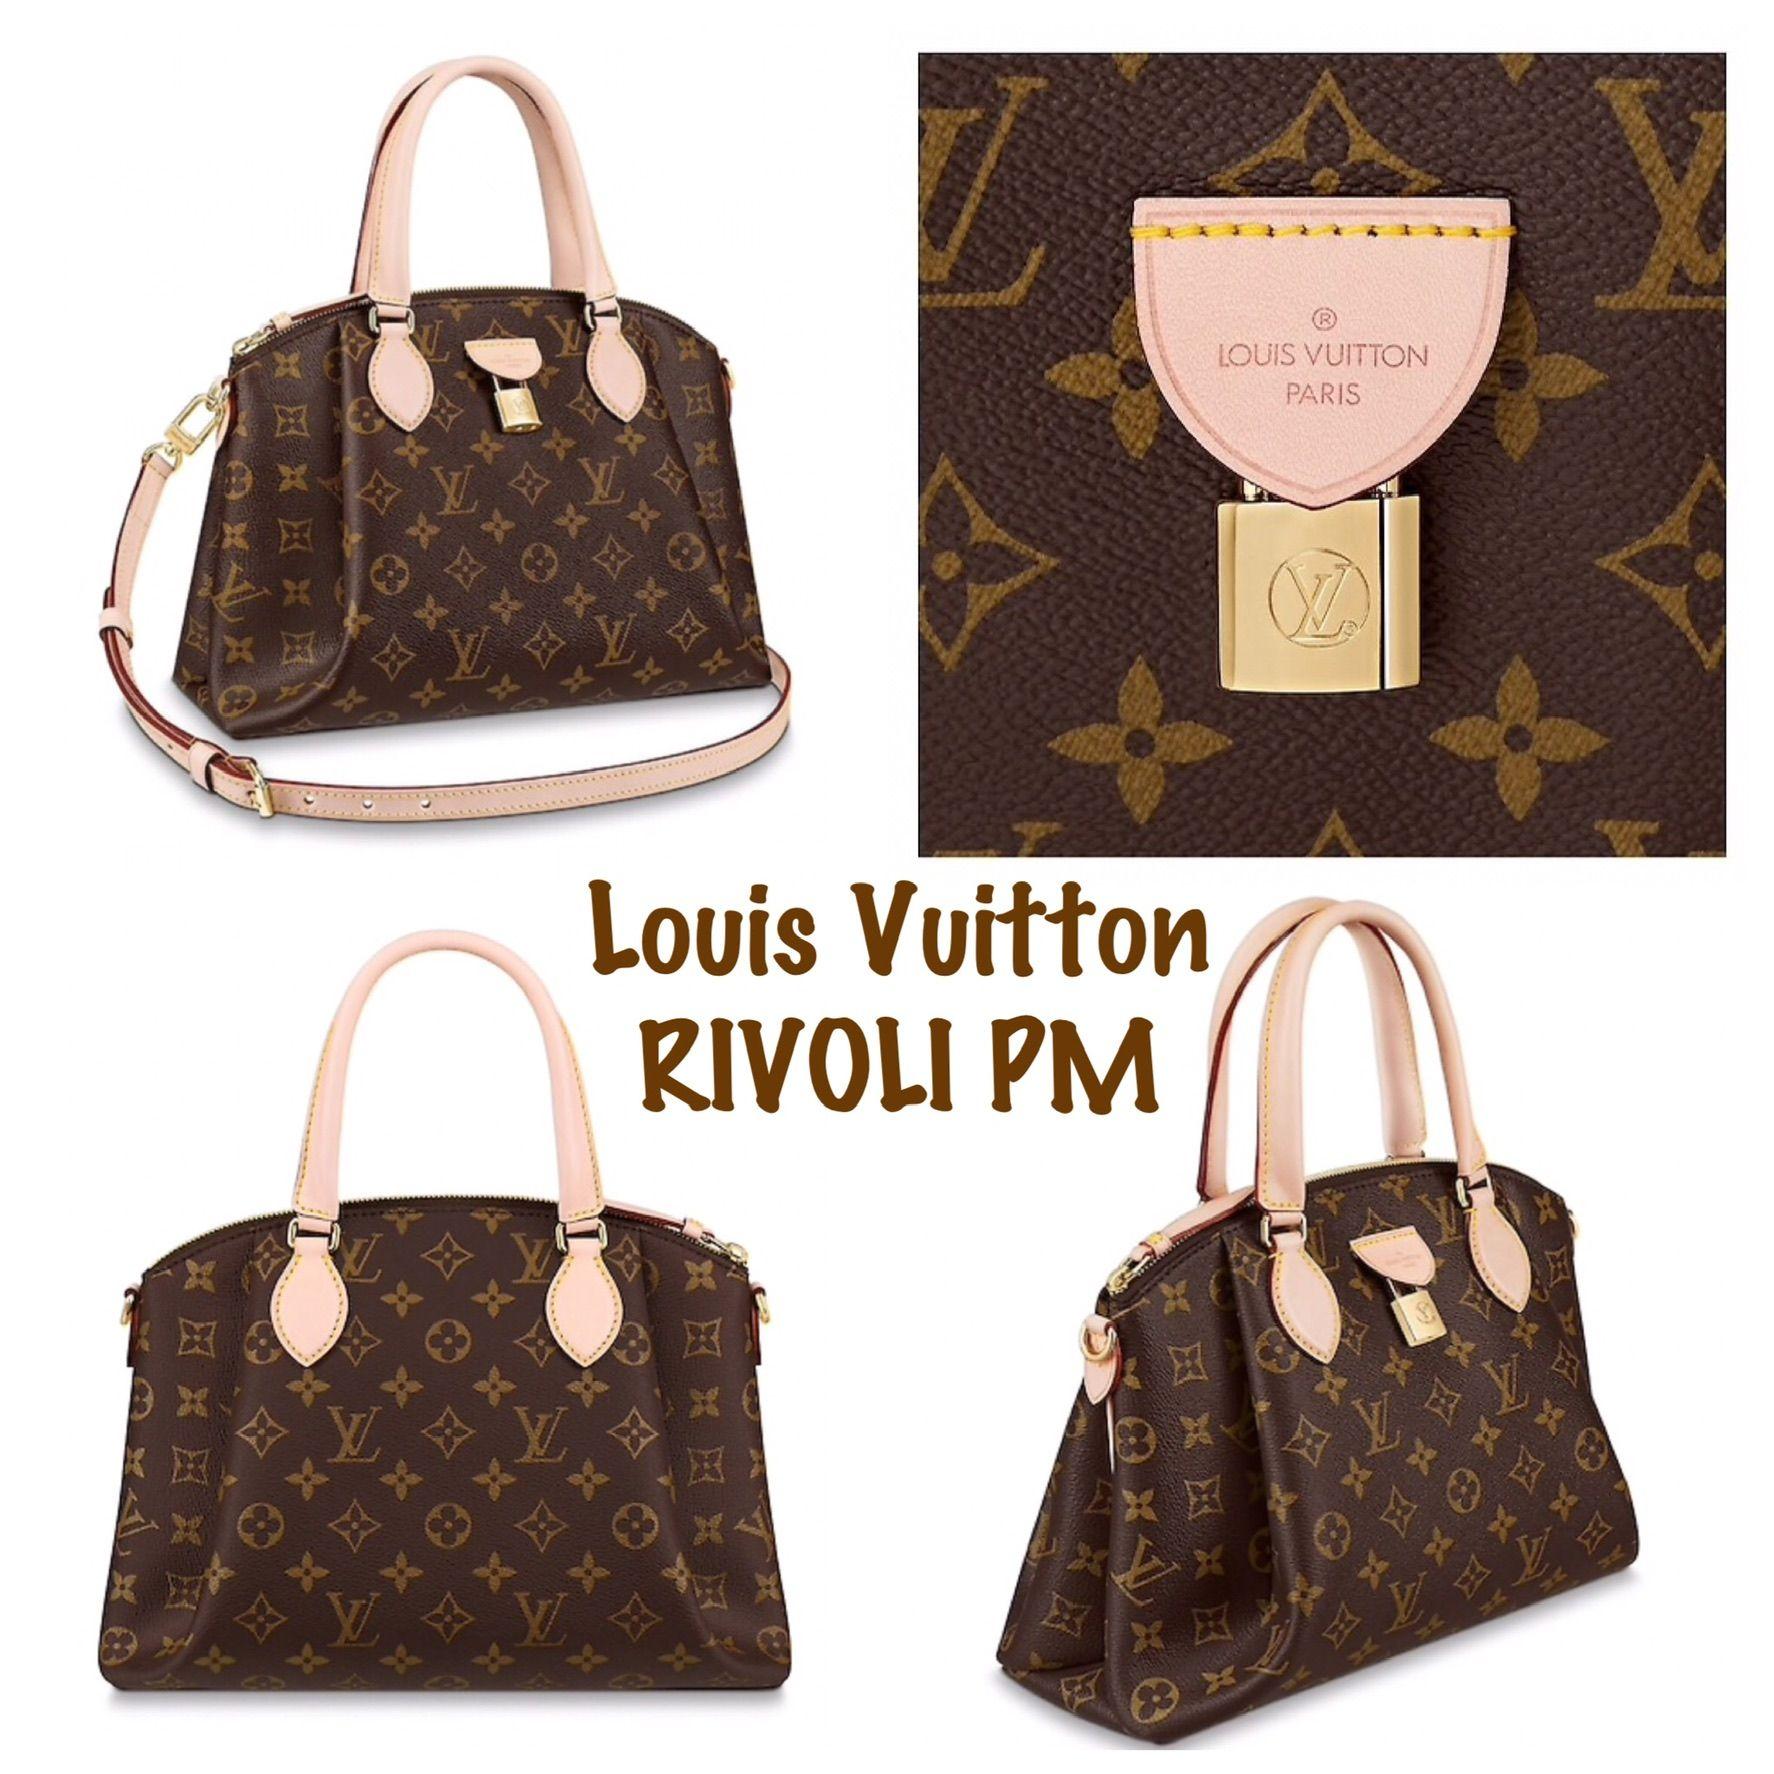 New Louis Vuitton Rivoli Pm Bag Handbags Purses Carry